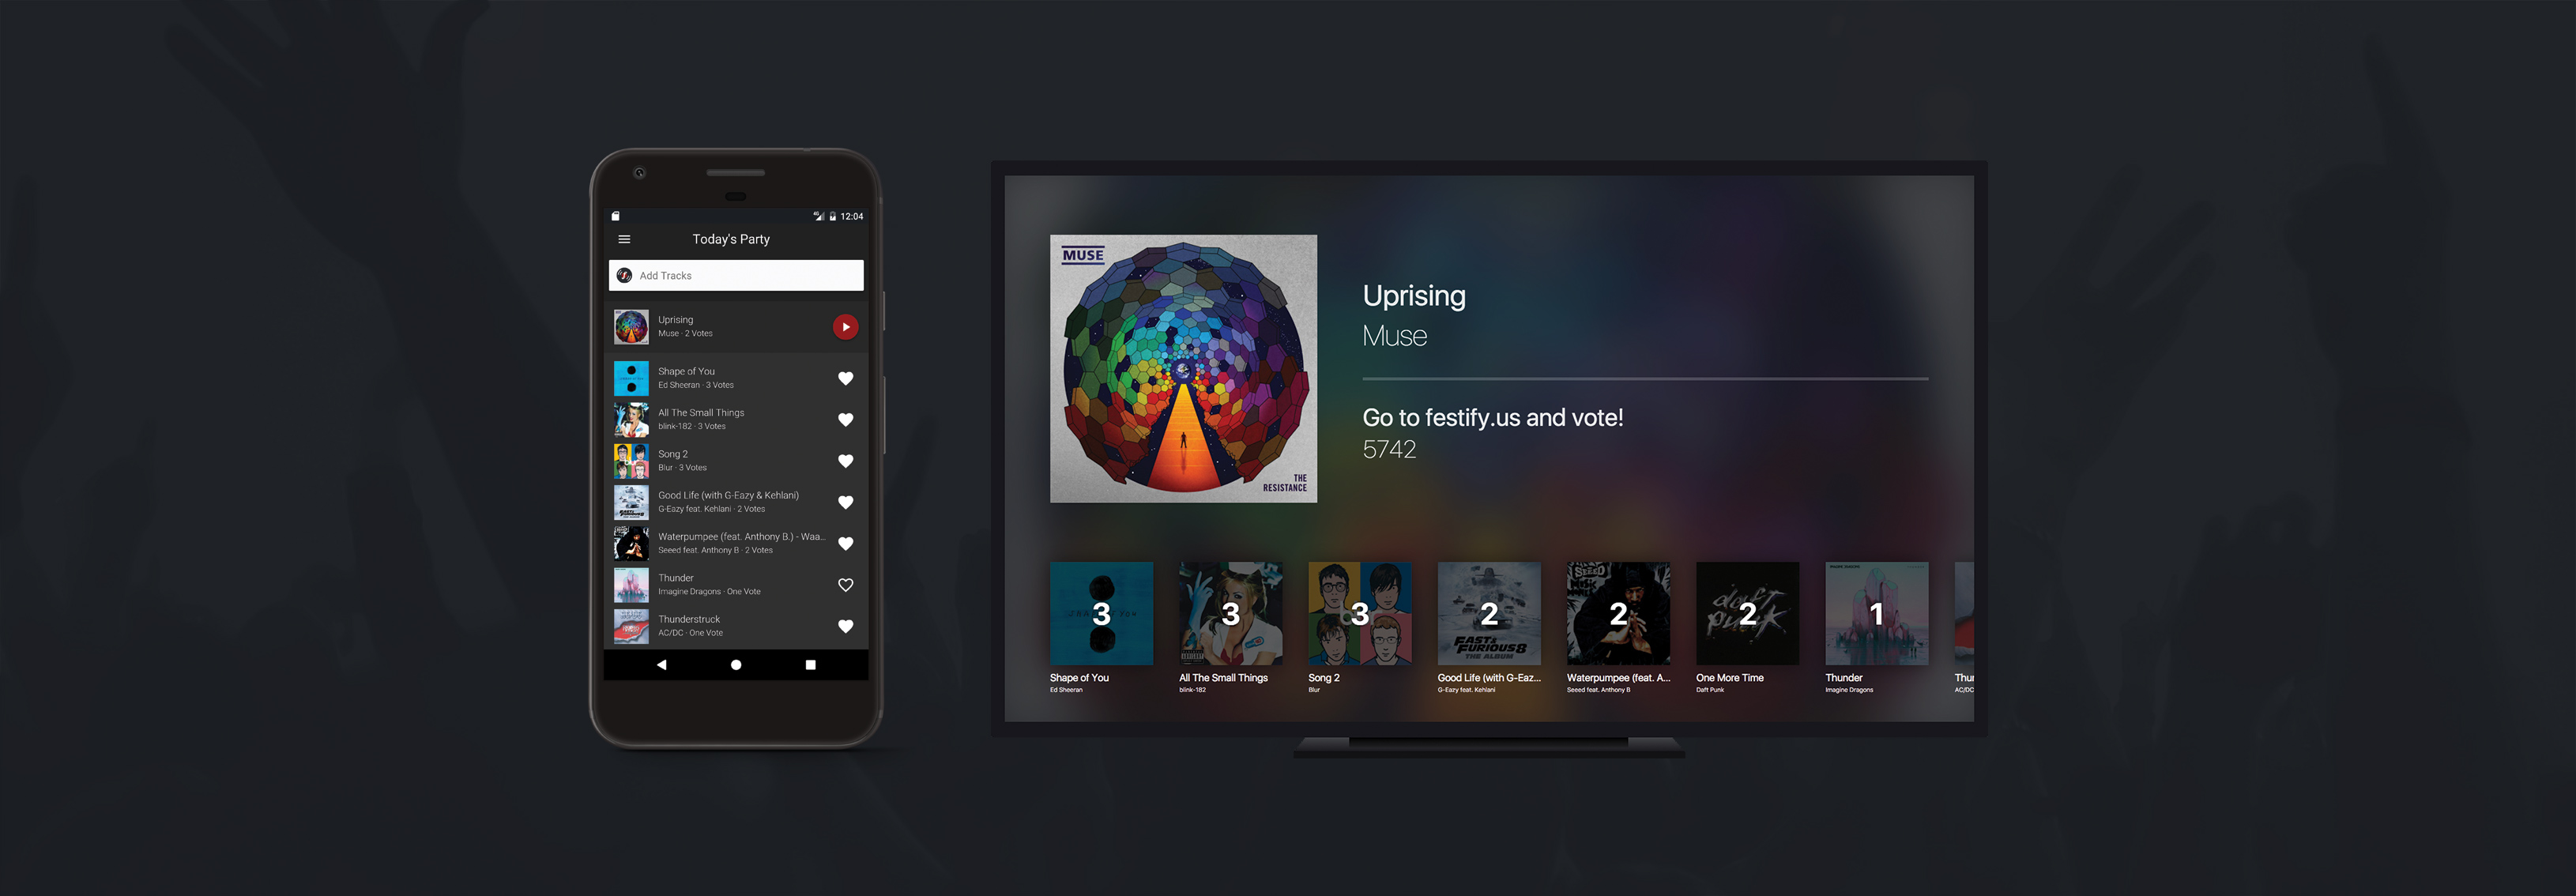 Phone and TV running Festify in Fullscreen Mode